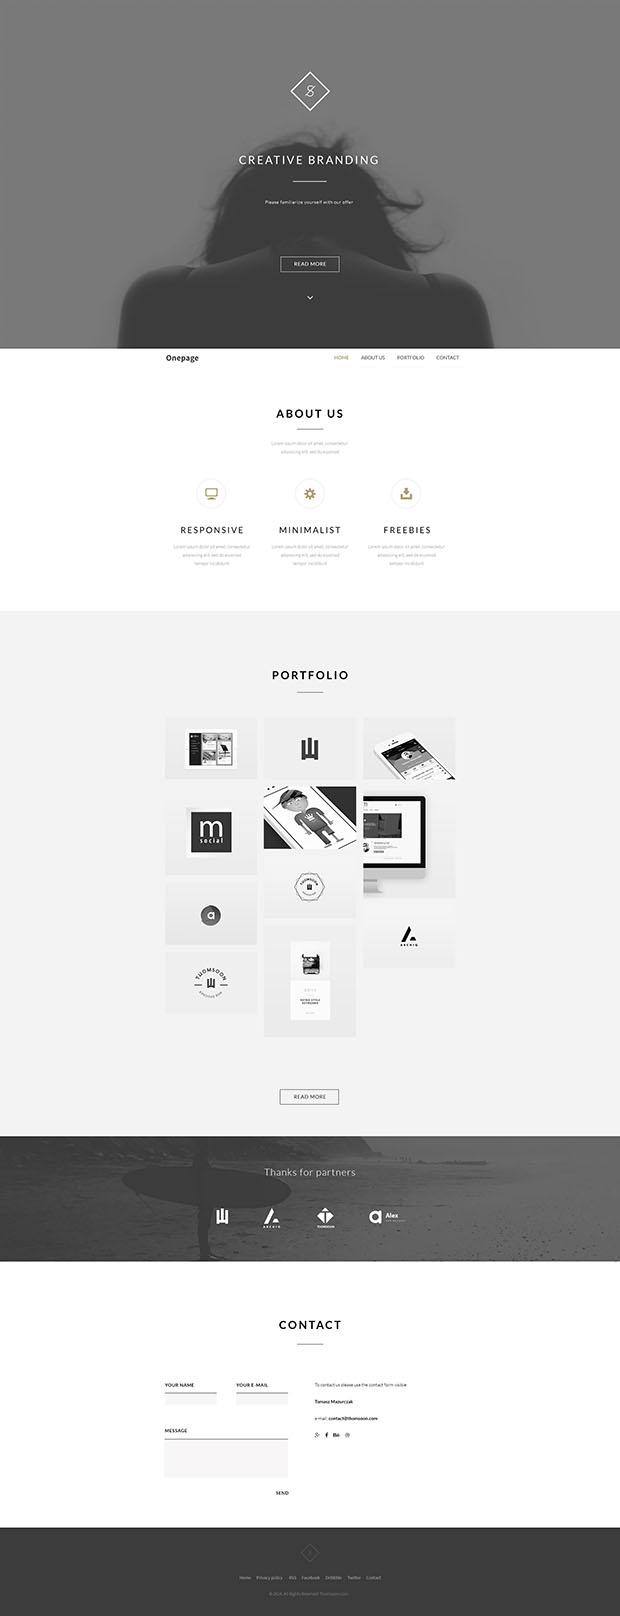 Free-Landing-Website-Clean-Template-PSD